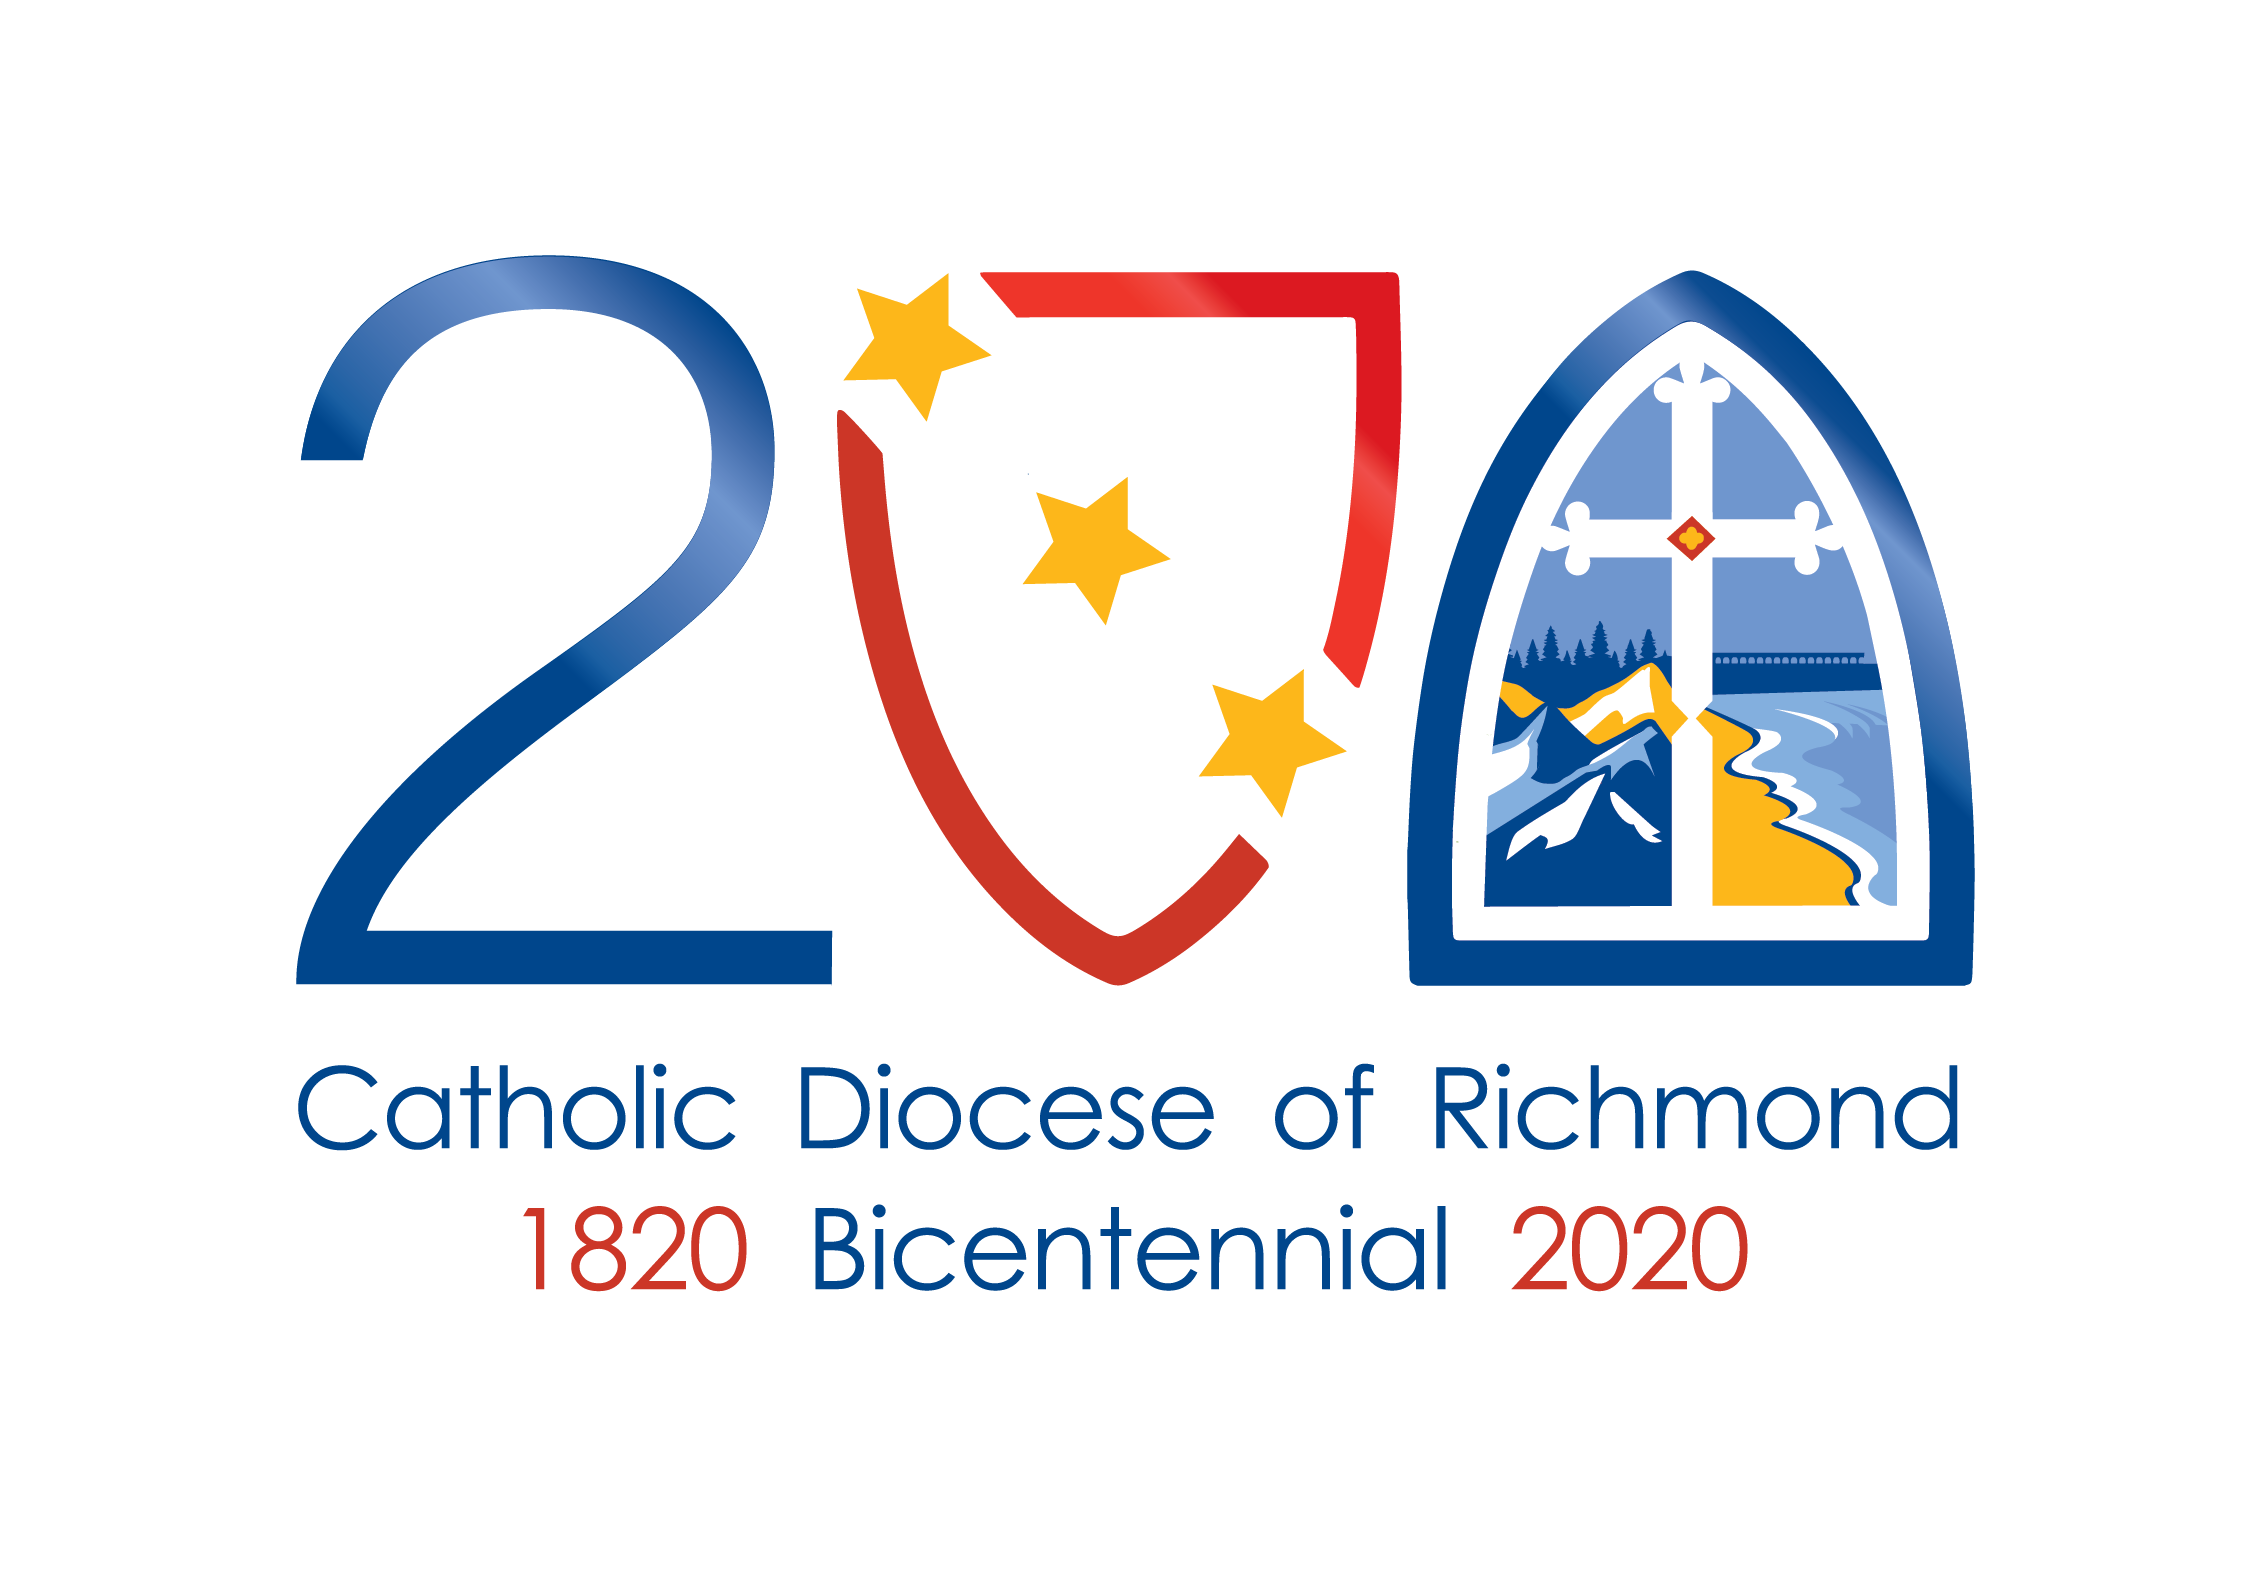 CDR-2020-Logo-Web.png (2266×1592)